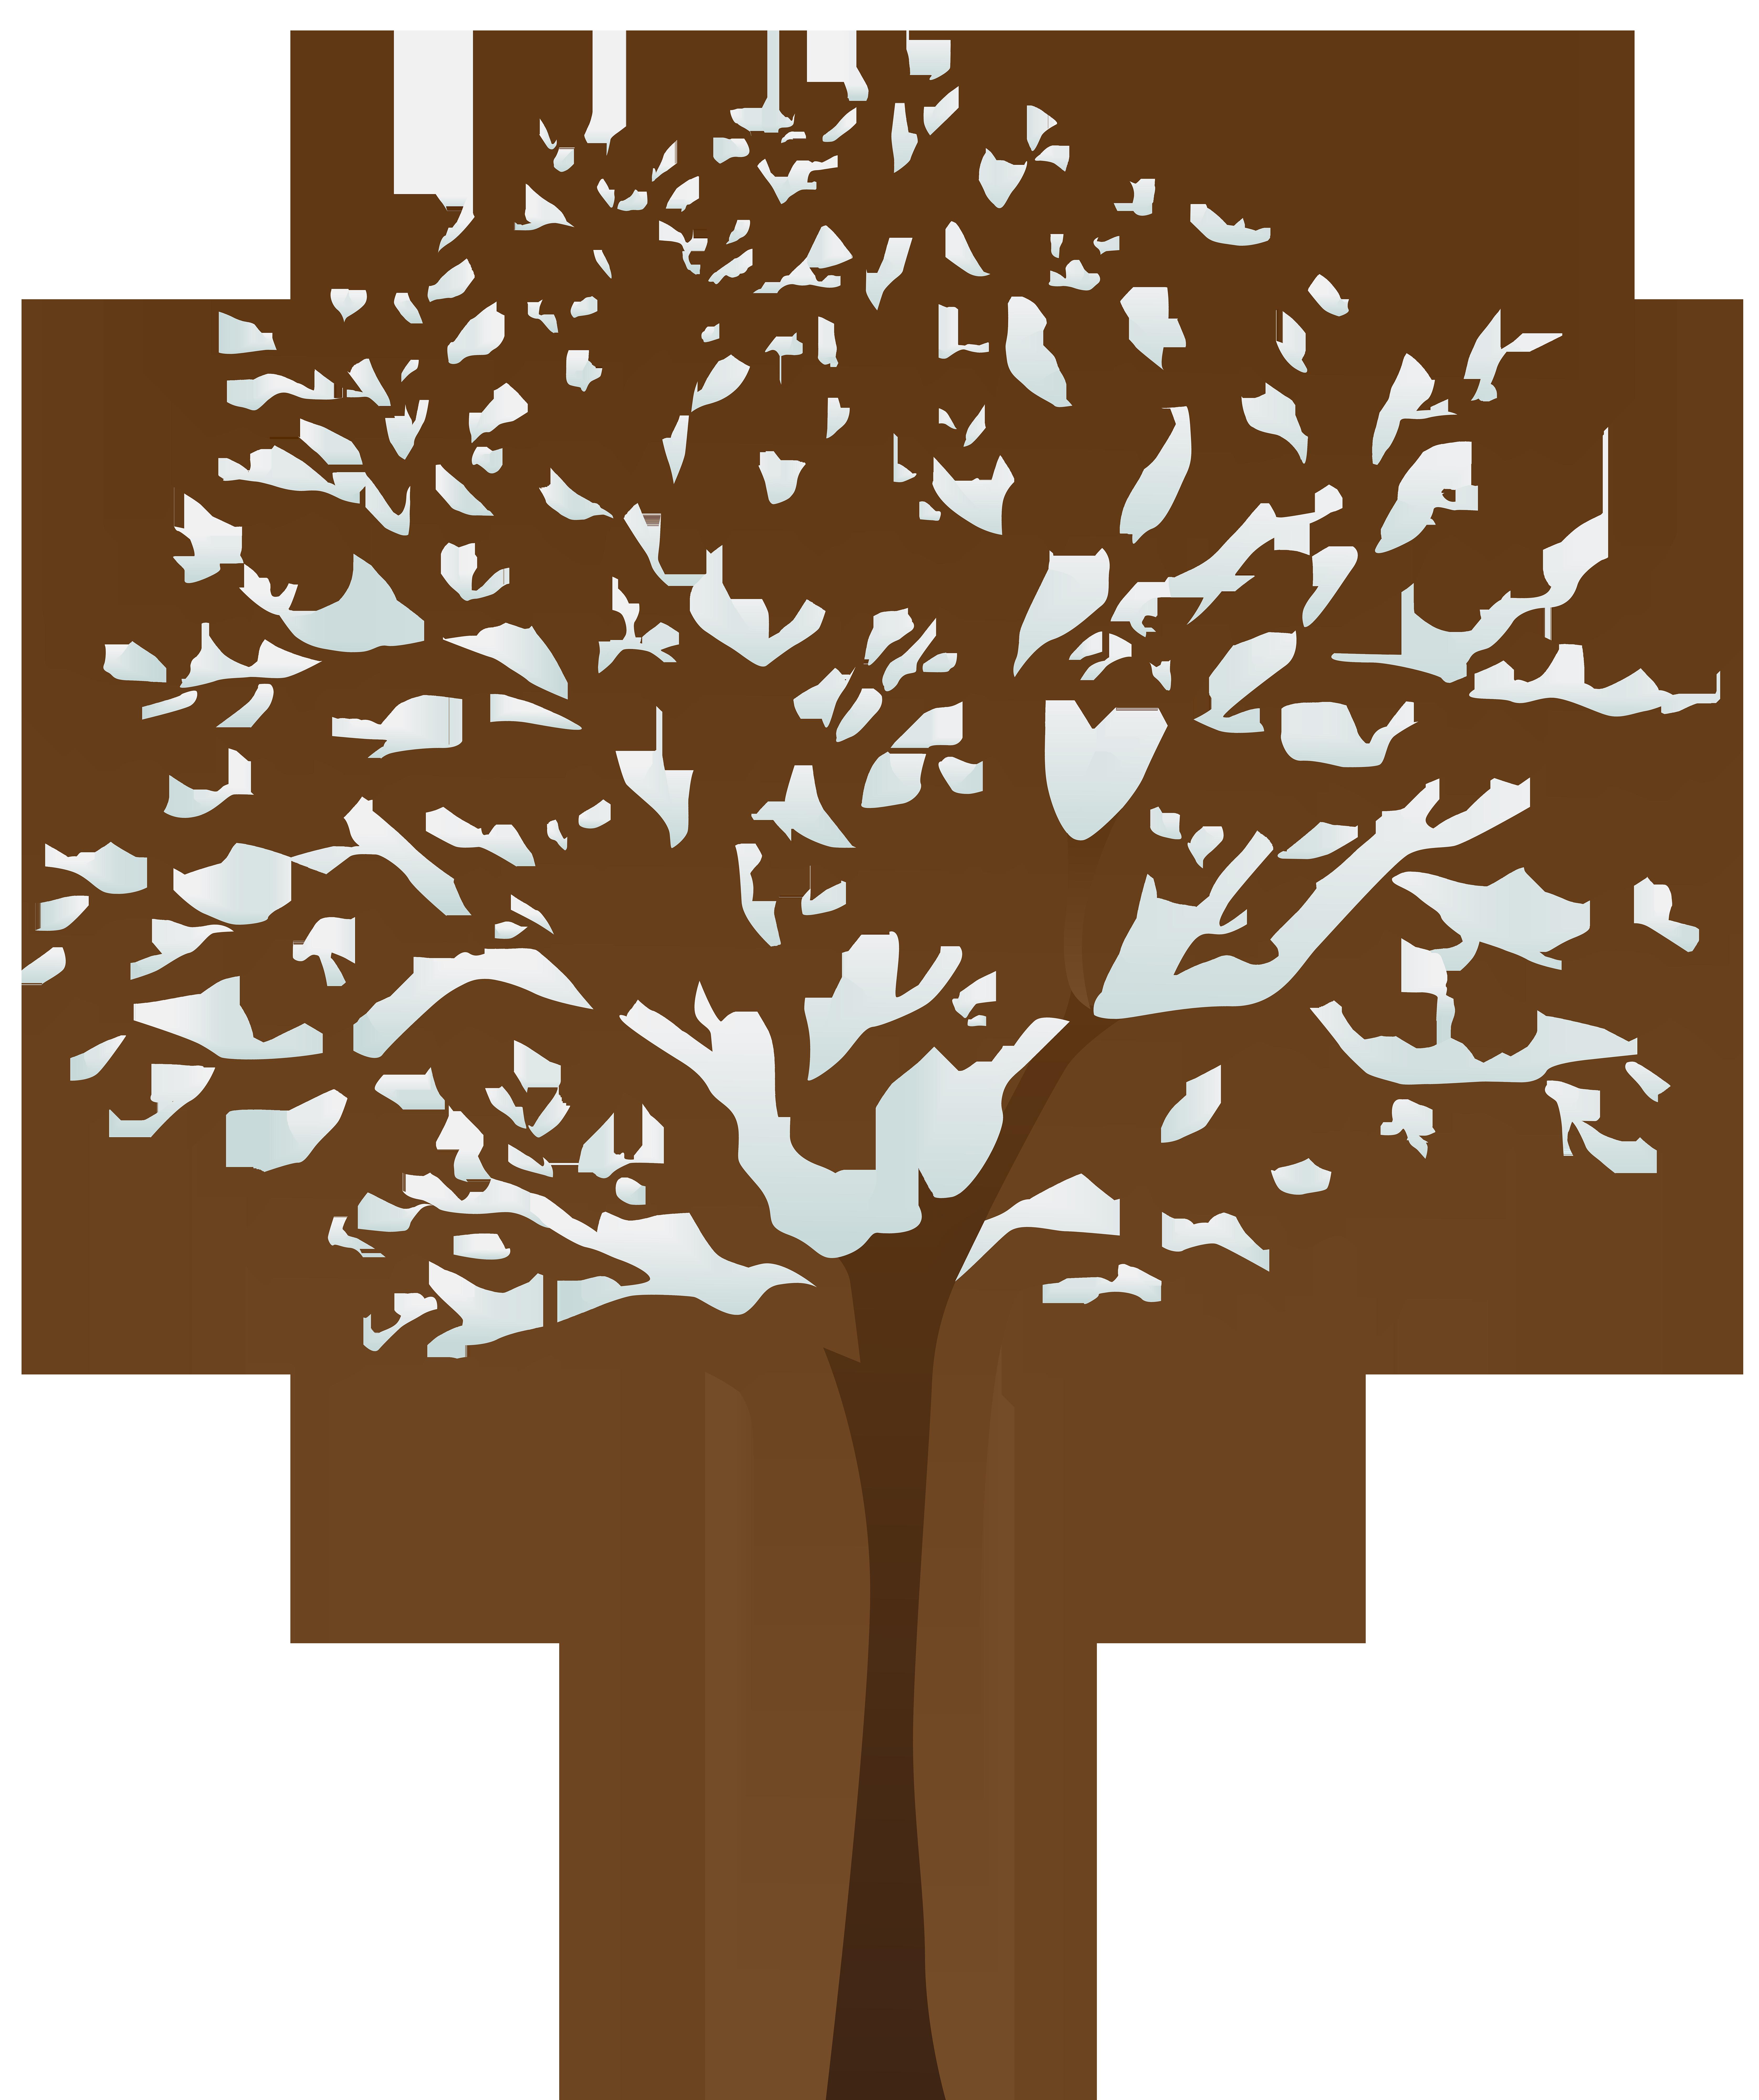 Winter Tree Clip Art - ClipArt Best